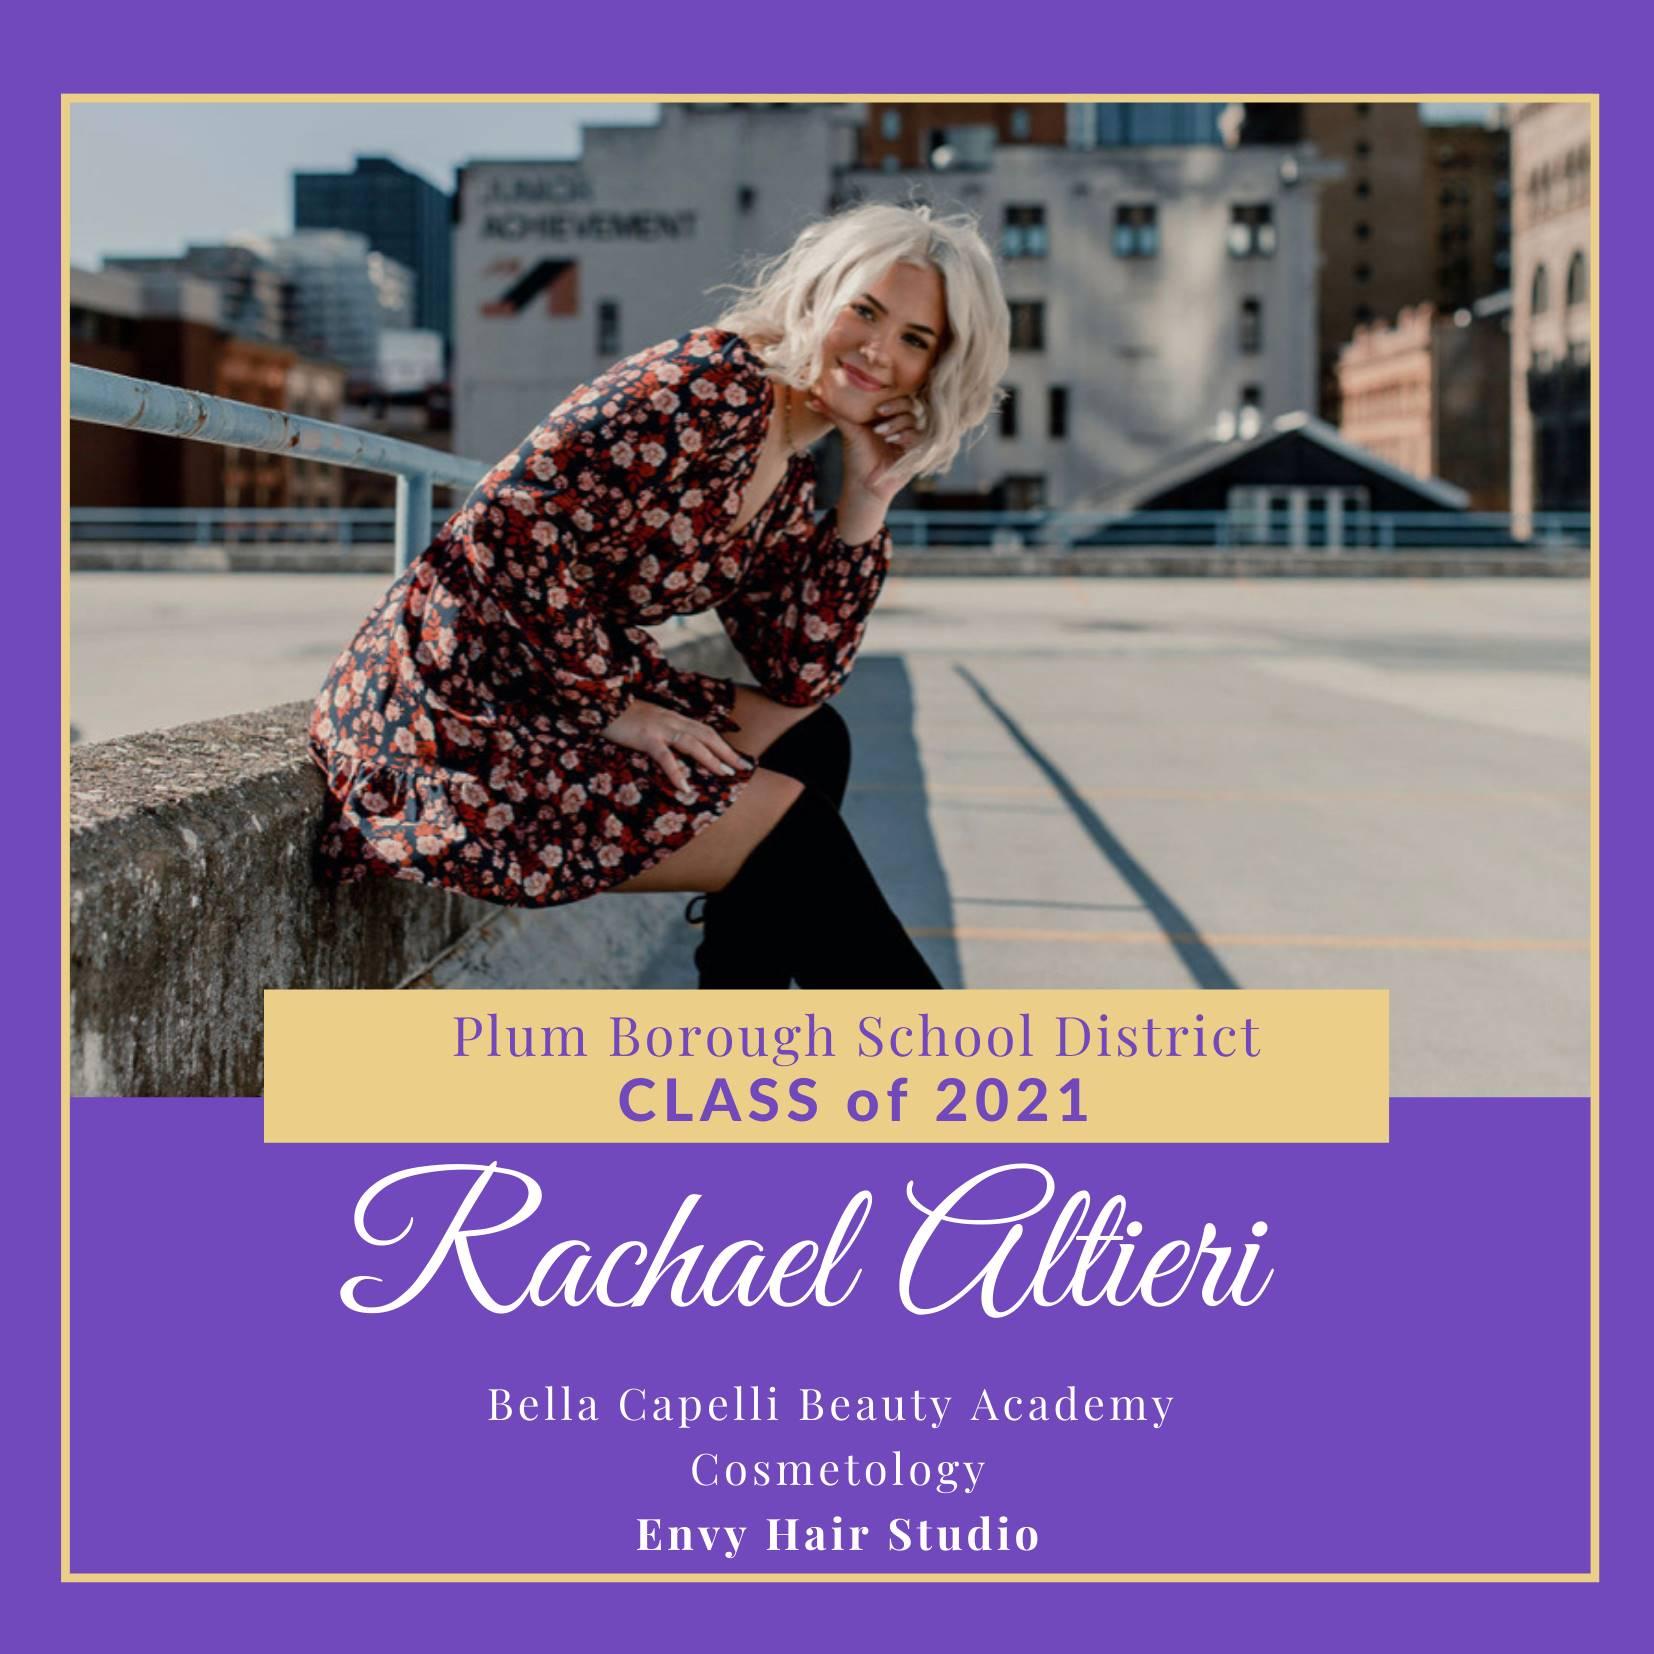 Congratulations to Rachael Altieri, Class of 2021!